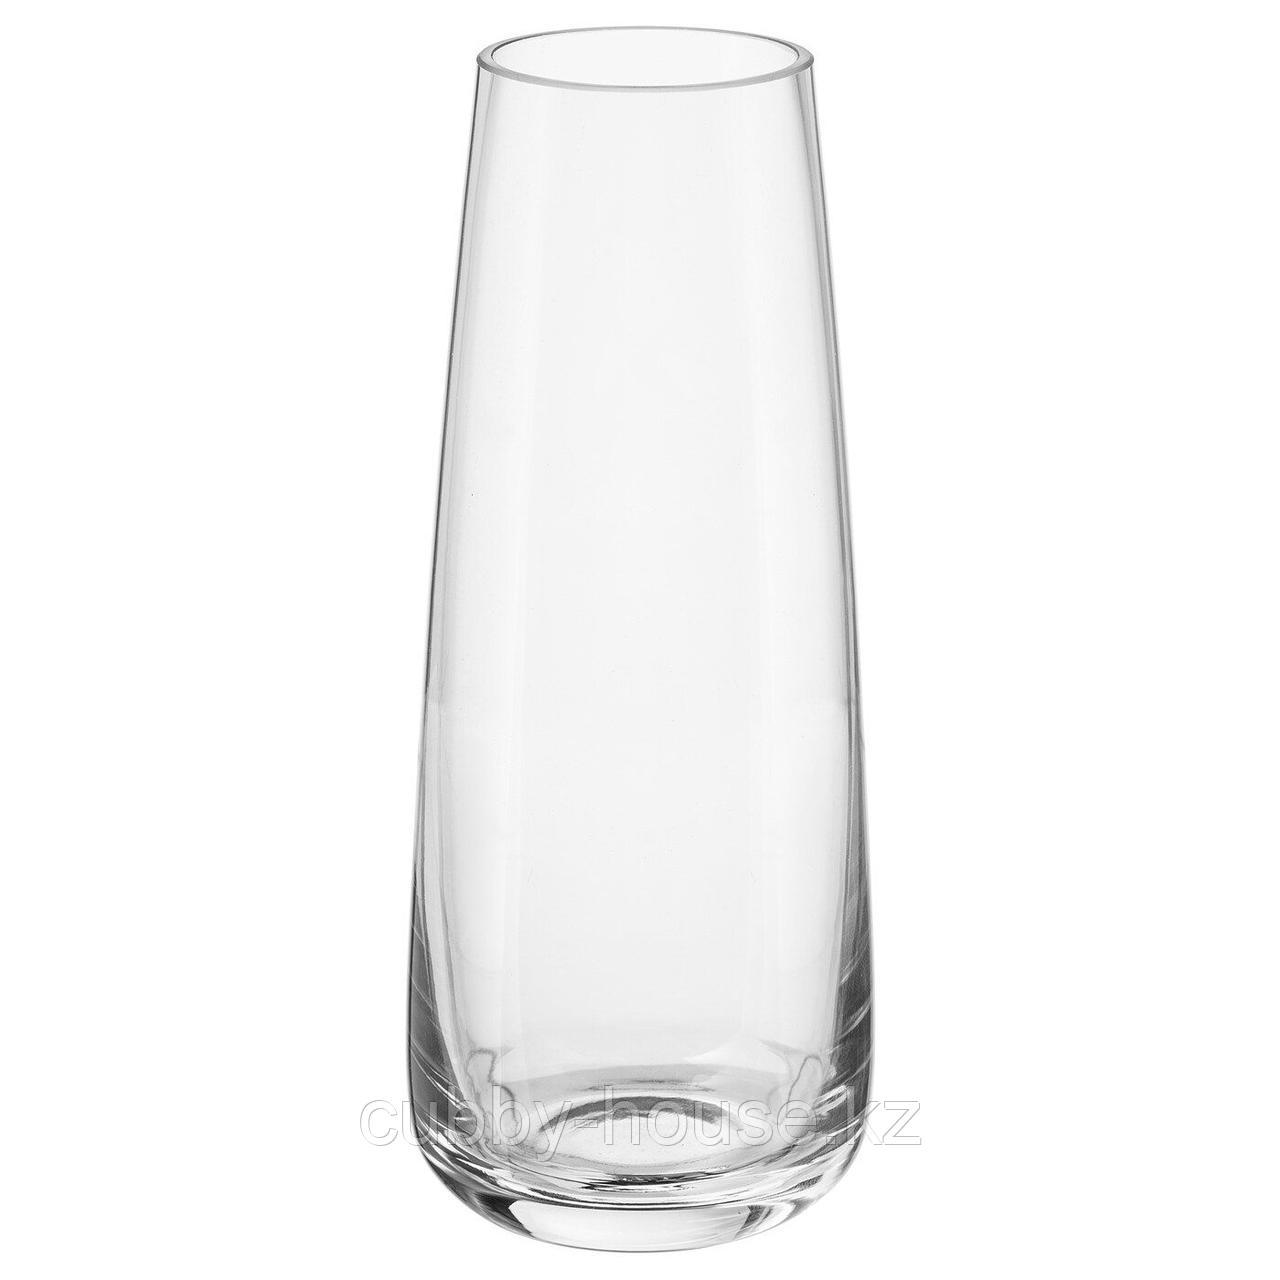 БЕРЭКНА Ваза, прозрачное стекло, 15 см